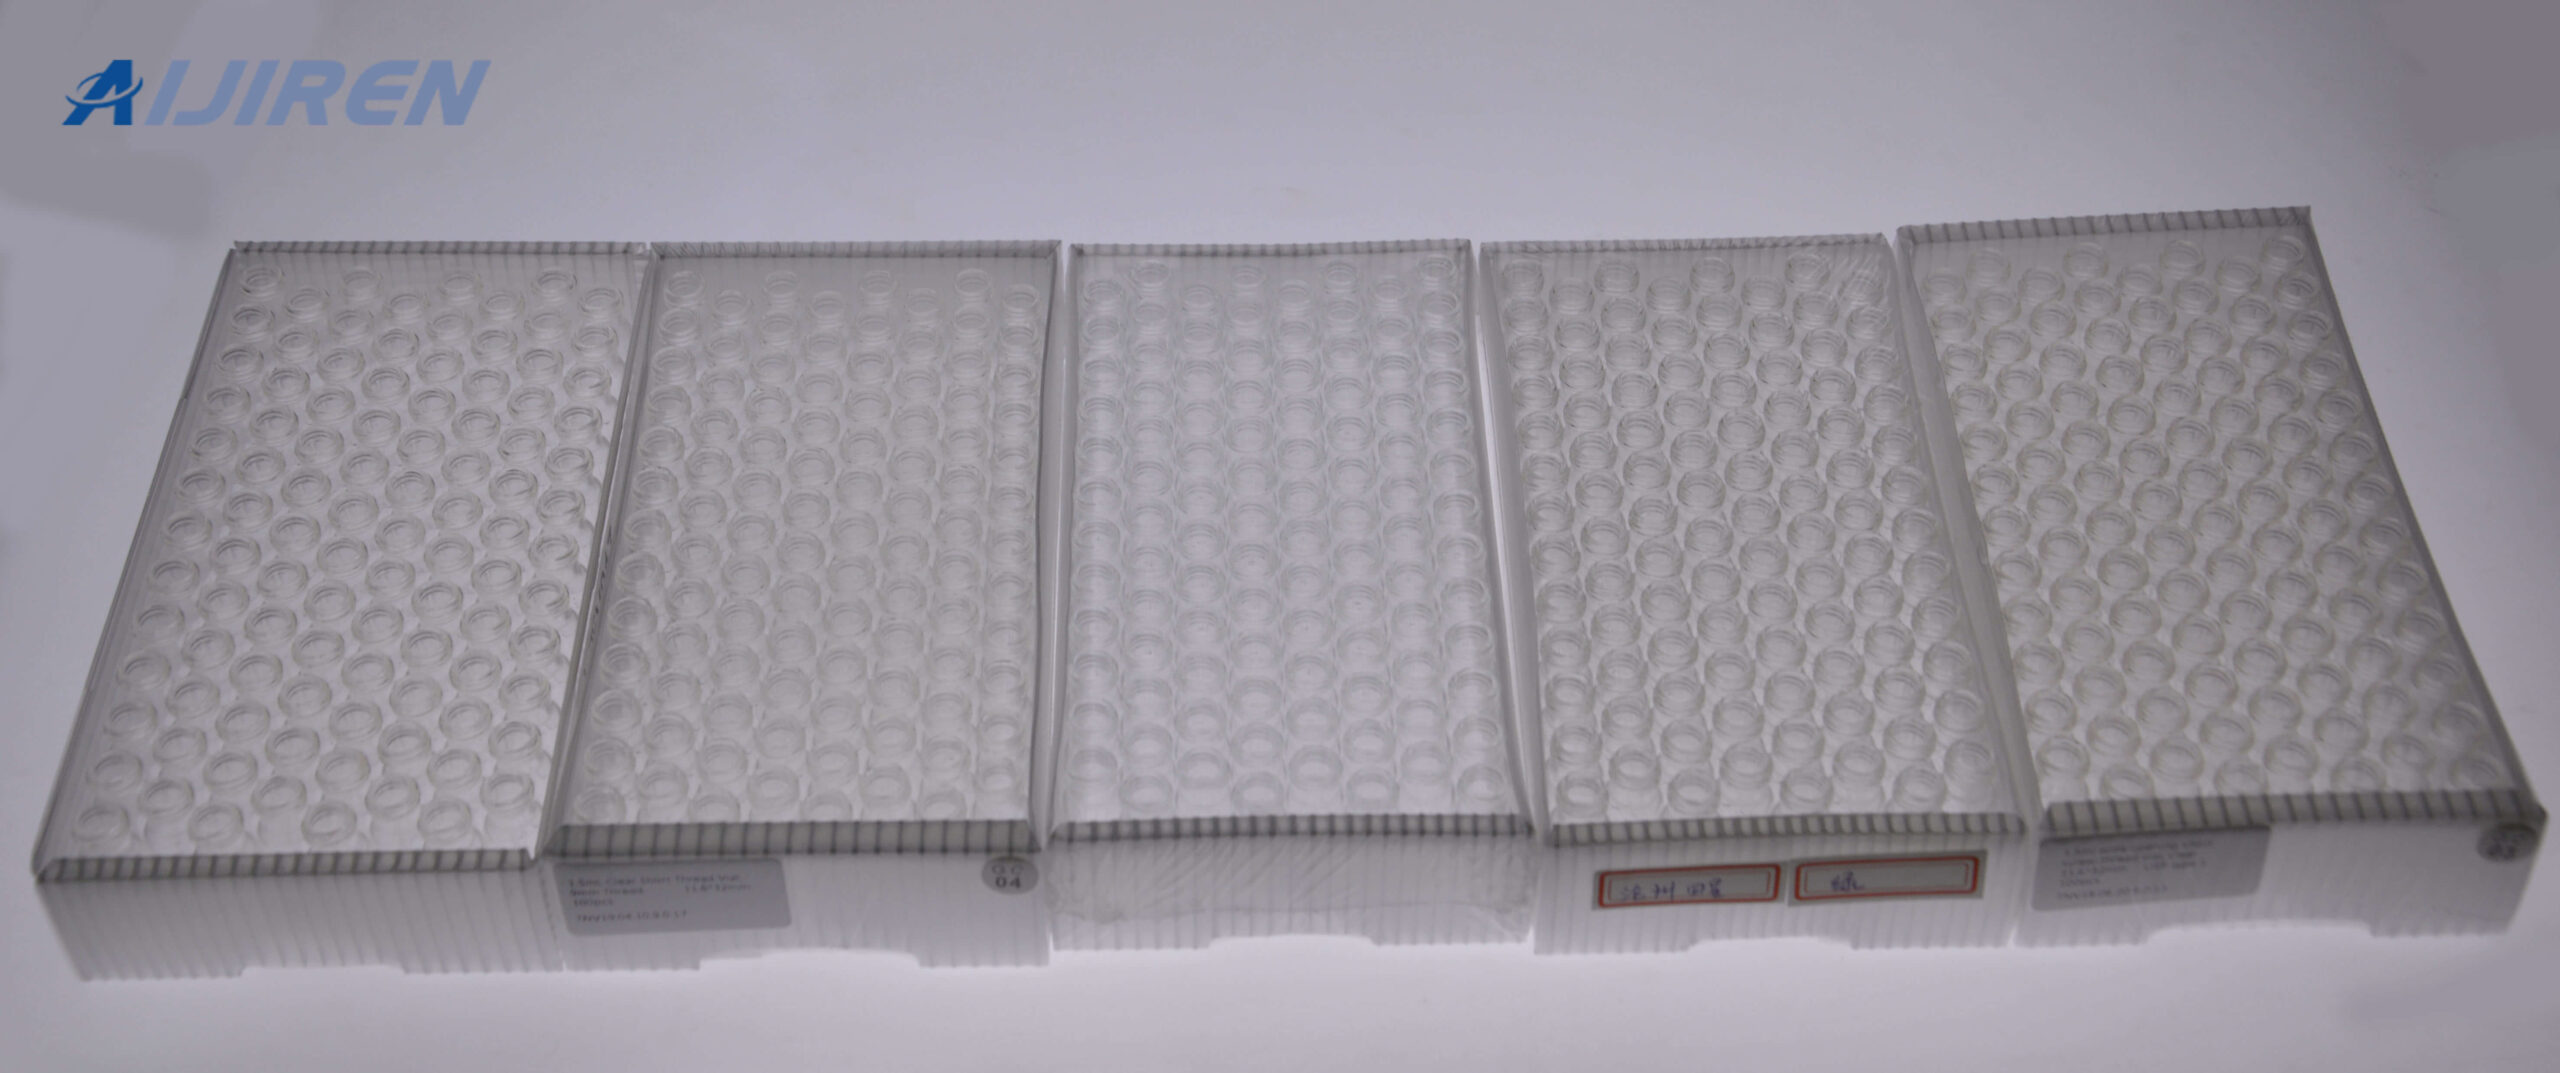 2-4ml Autosampler Vial Manufacturer